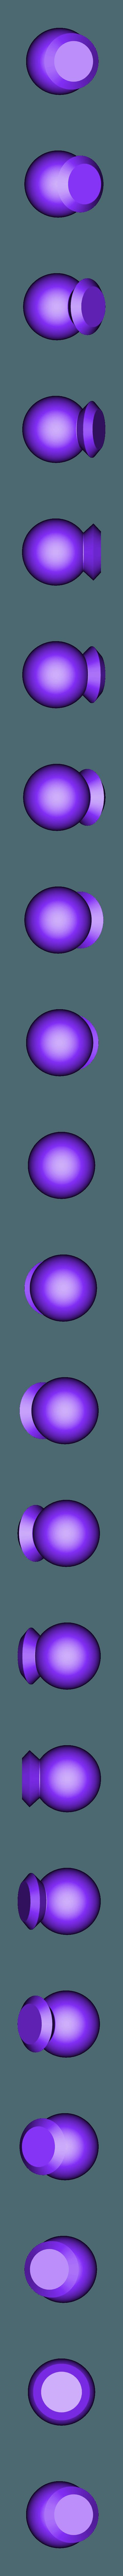 Pearl Charm.stl Download free STL file Charm Ring • 3D printable model, Lucy_Haribert